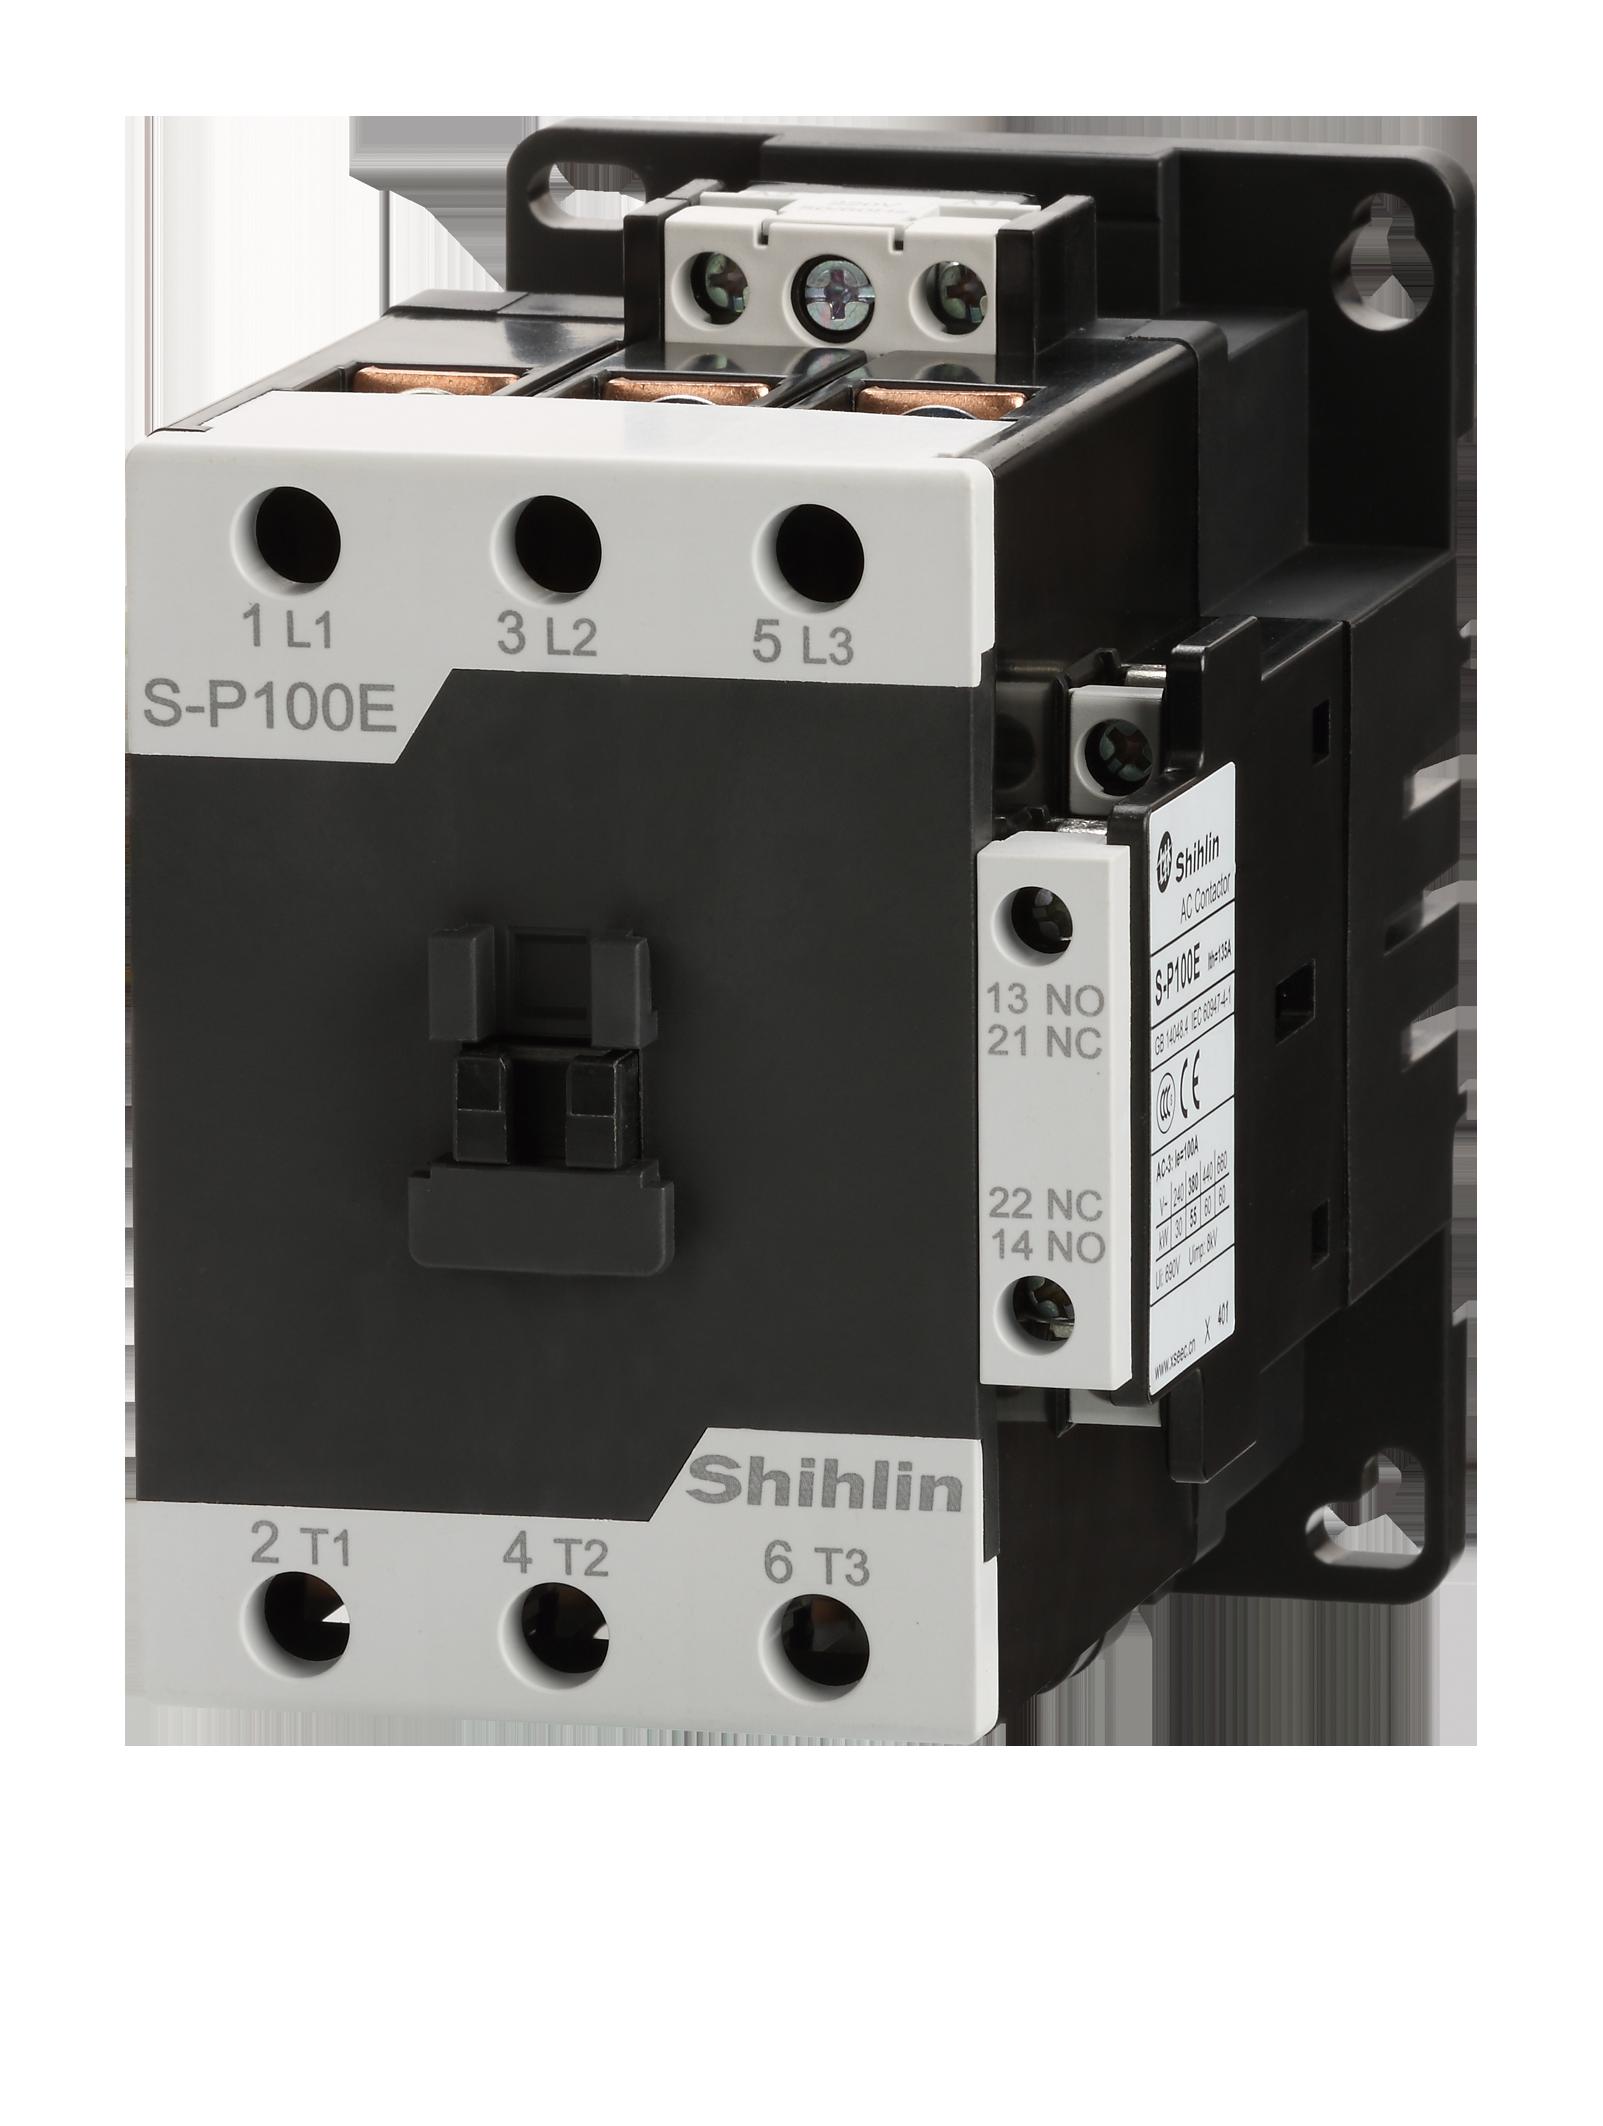 Shihlin Electric Manyetik Kontaktör S-P100E